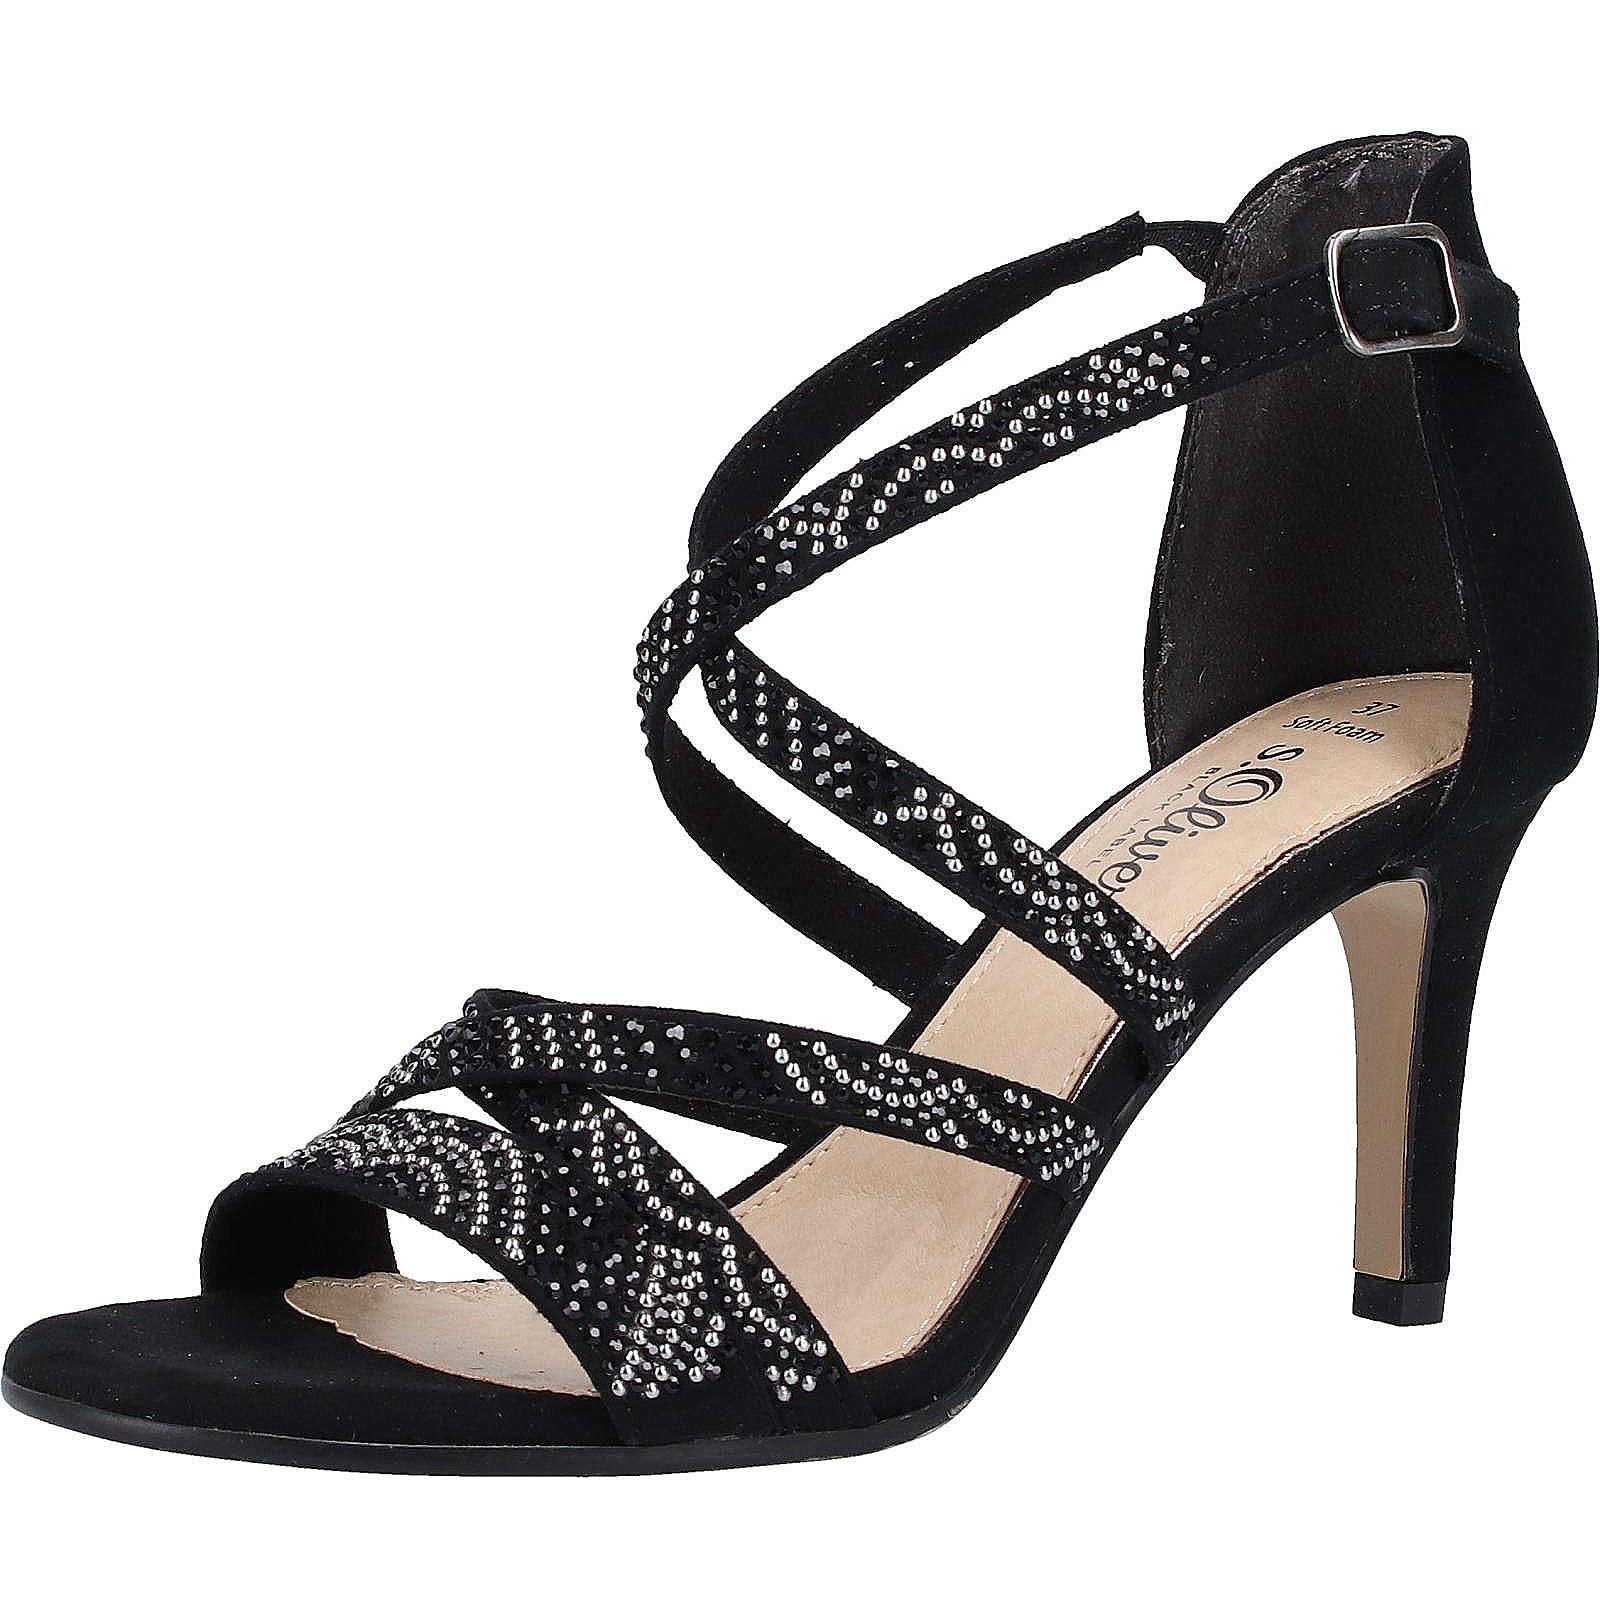 s.Oliver Shoes Sandalen Plateau-Sandaletten schwarz Damen Gr. 36